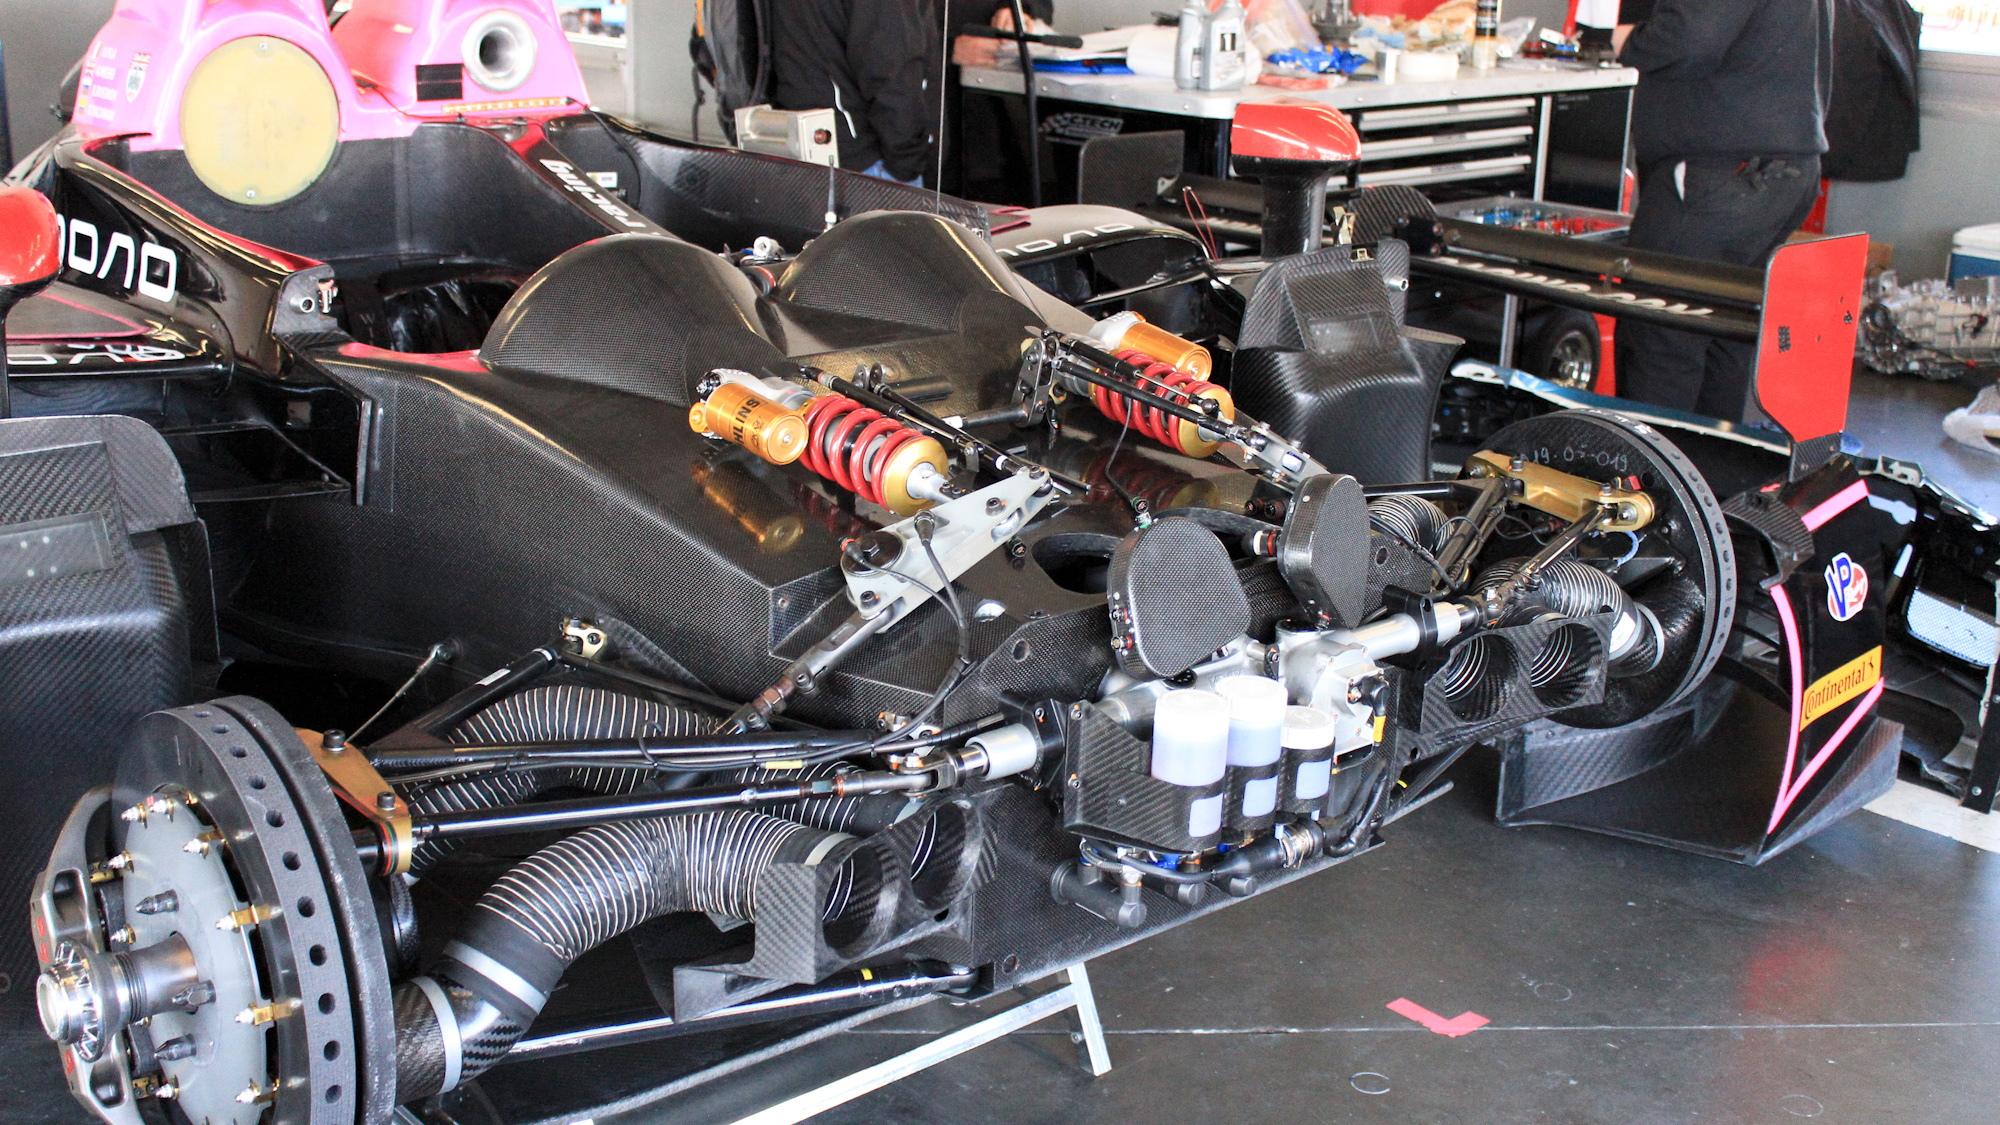 2014 Rolex 24 at Daytona, Friday, Garages